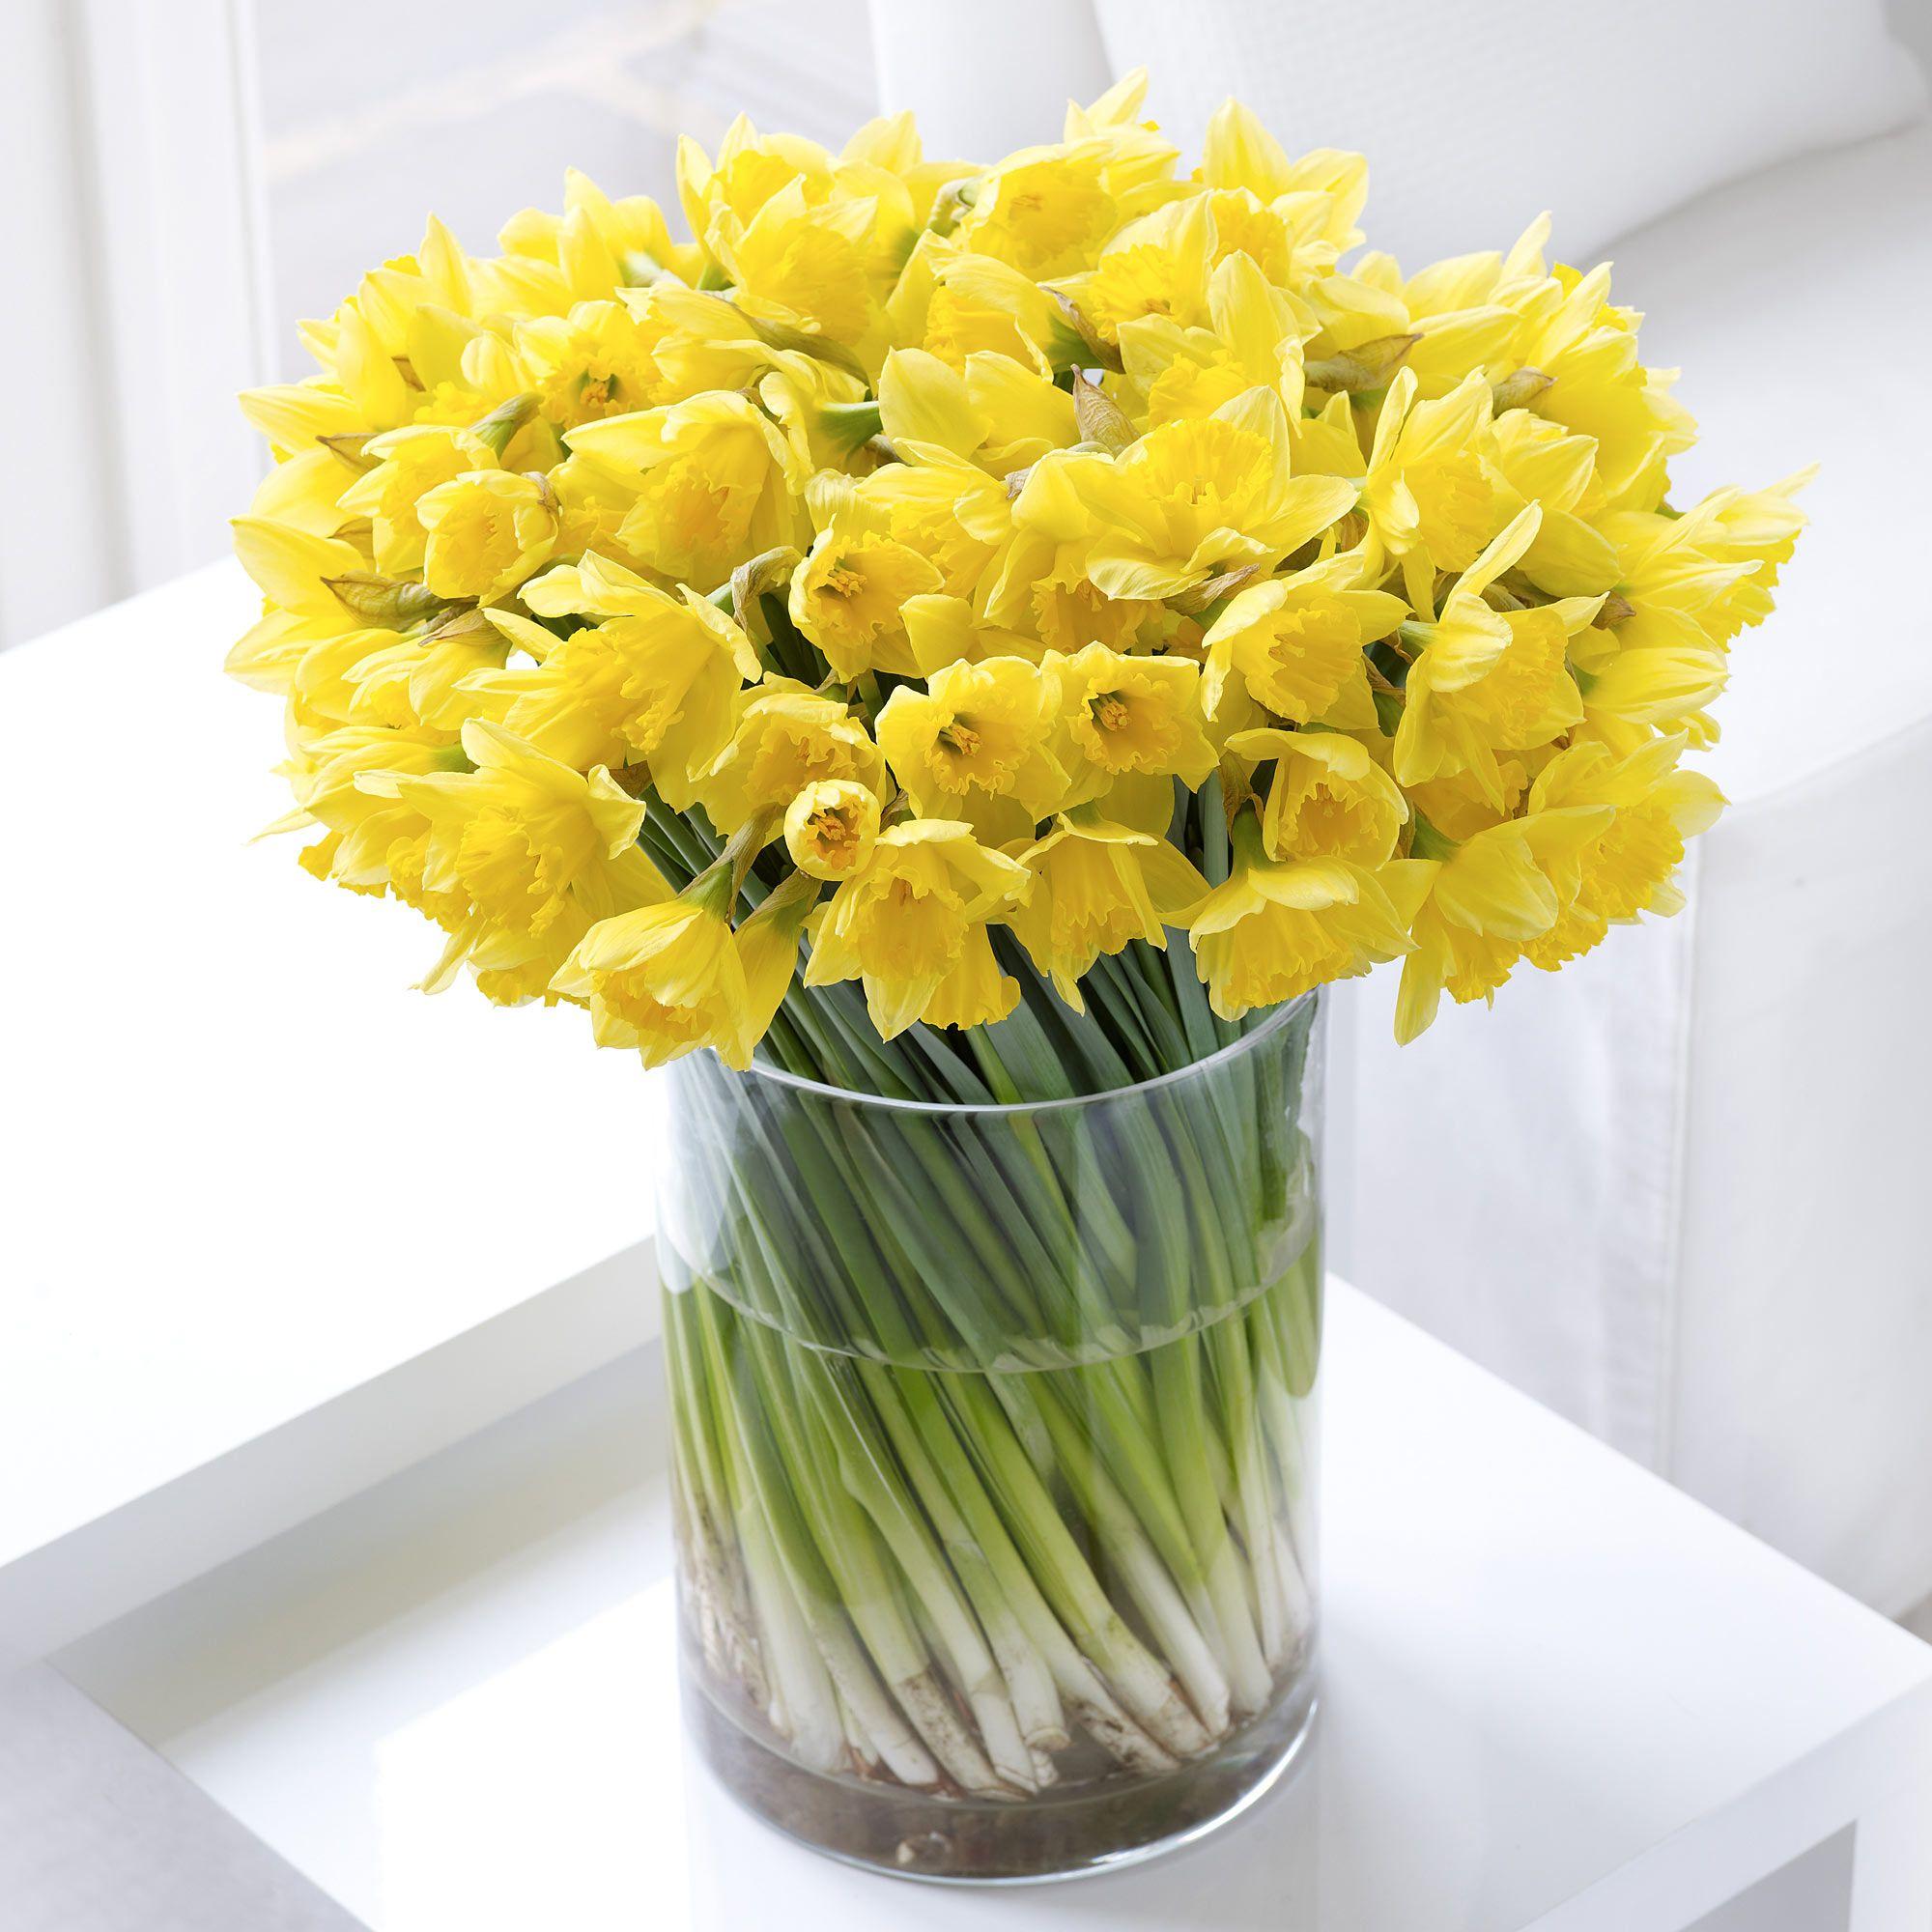 100 narcissi blooms in vase pinterest 100 narcissi blooms in vase mightylinksfo